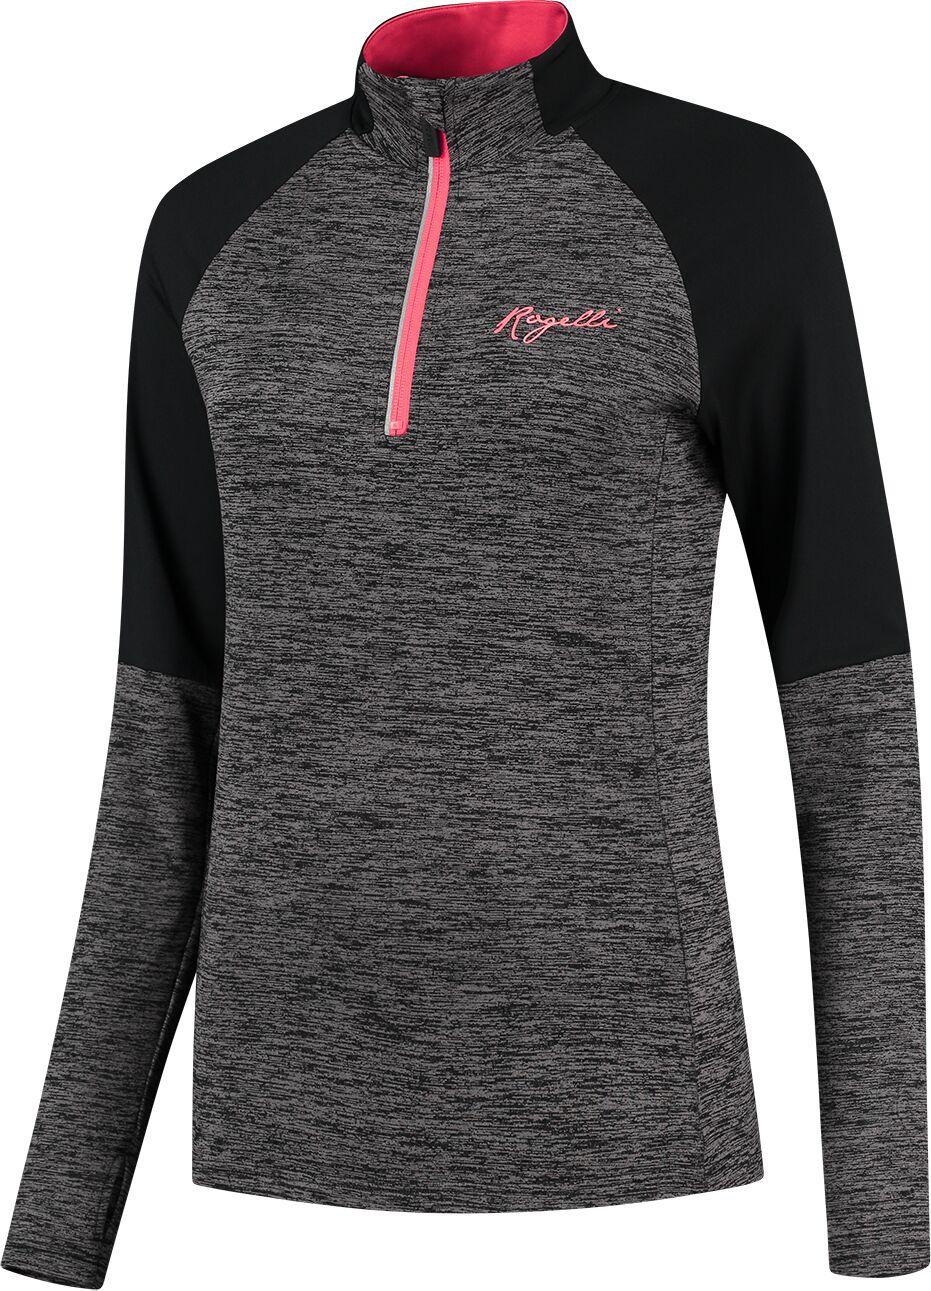 ROGELLI bluza do biegania damska ENJOY grey ROG351109 Rozmiar: XL,ROG351109.XS